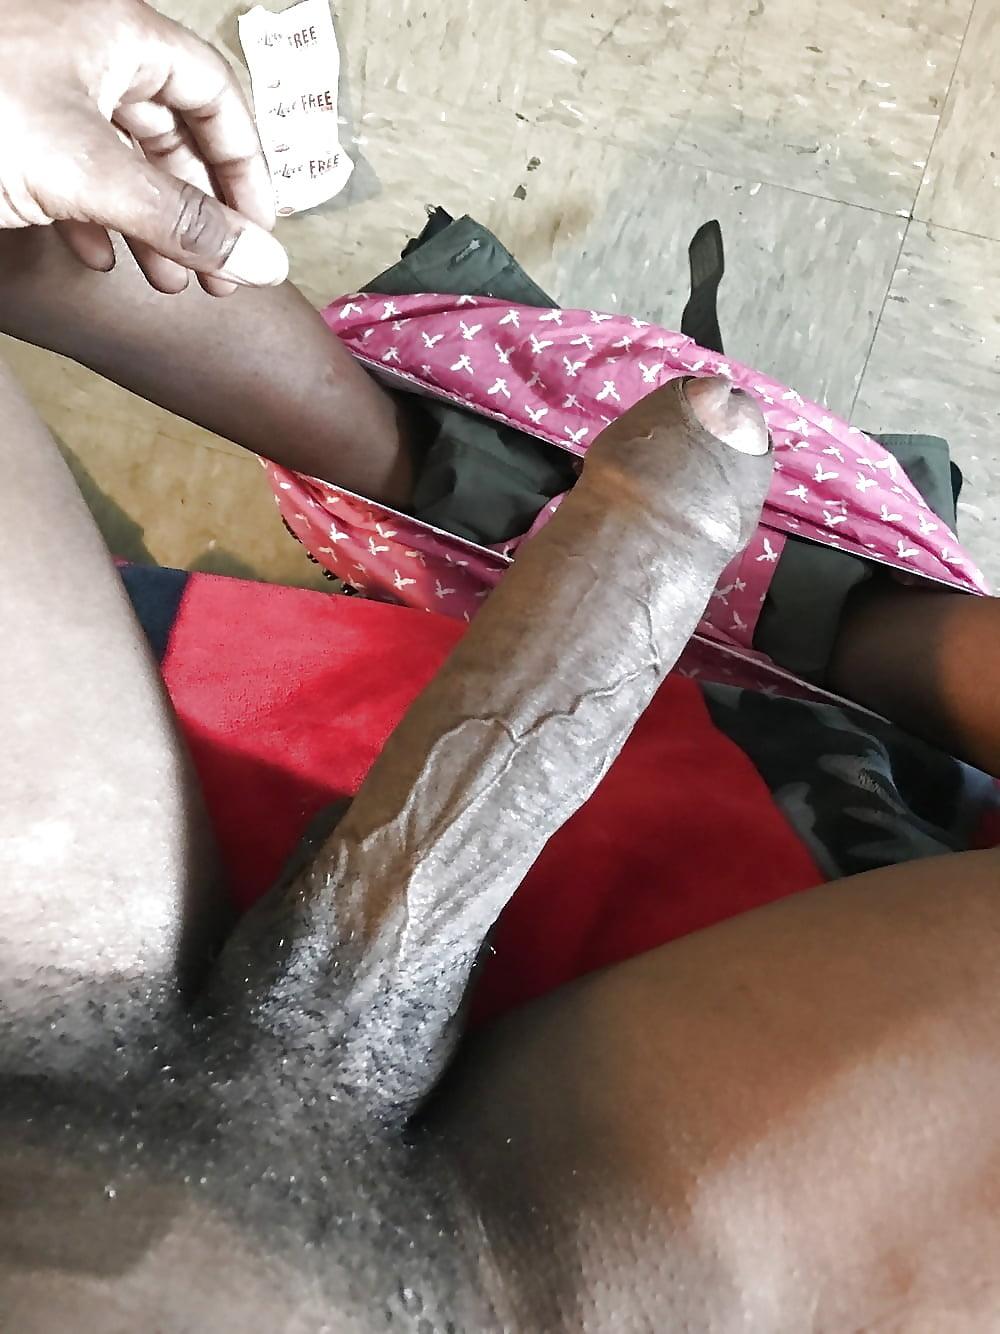 Porn man sucking boobs-9246